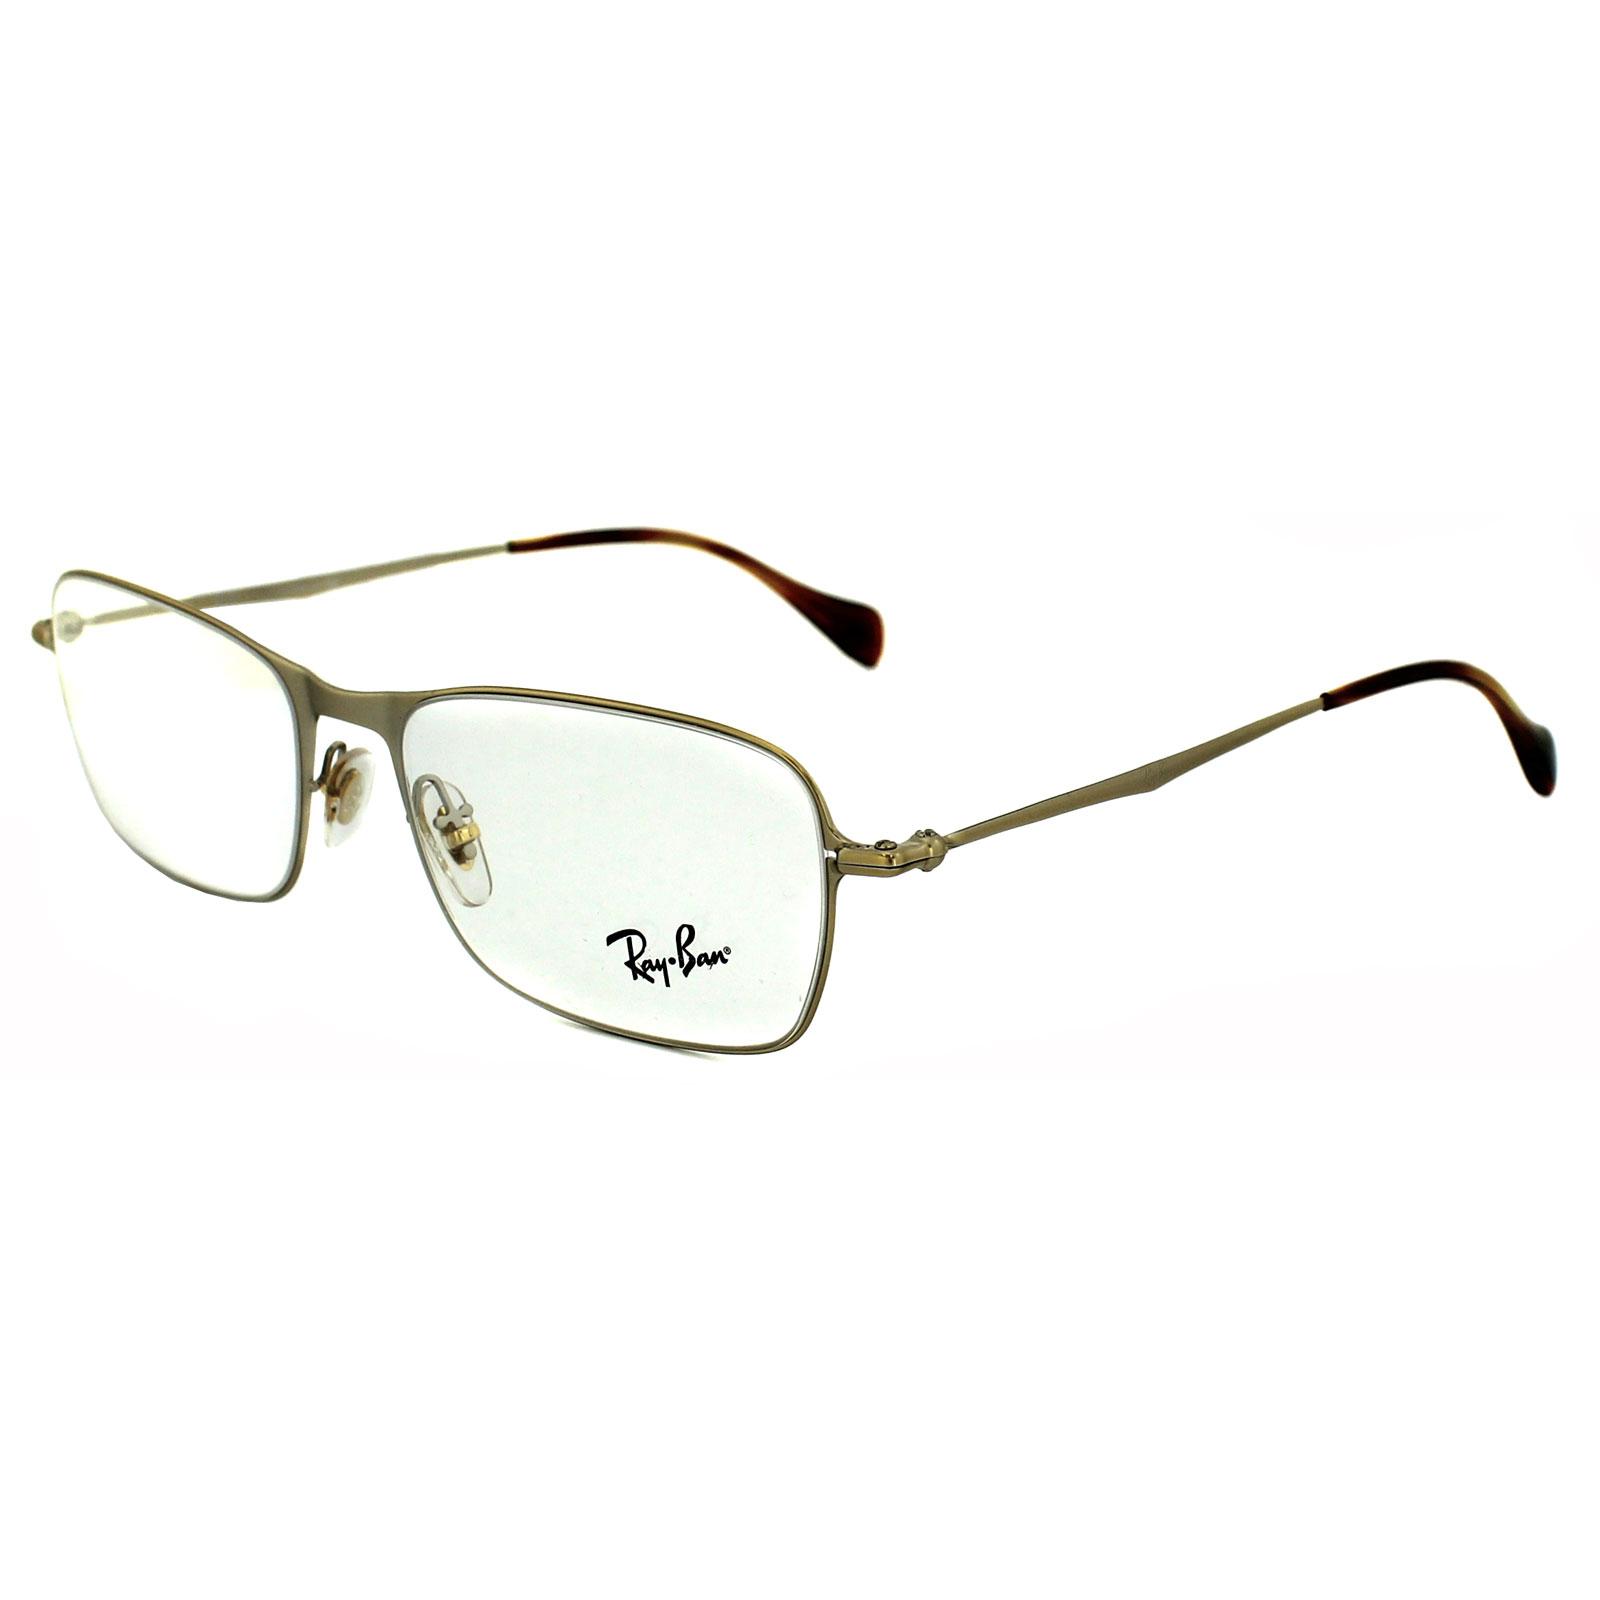 aeb2e8c8301fa Ray-Ban Glasses Frames 6253 2754 Semi Shiny Gold 8053672060034